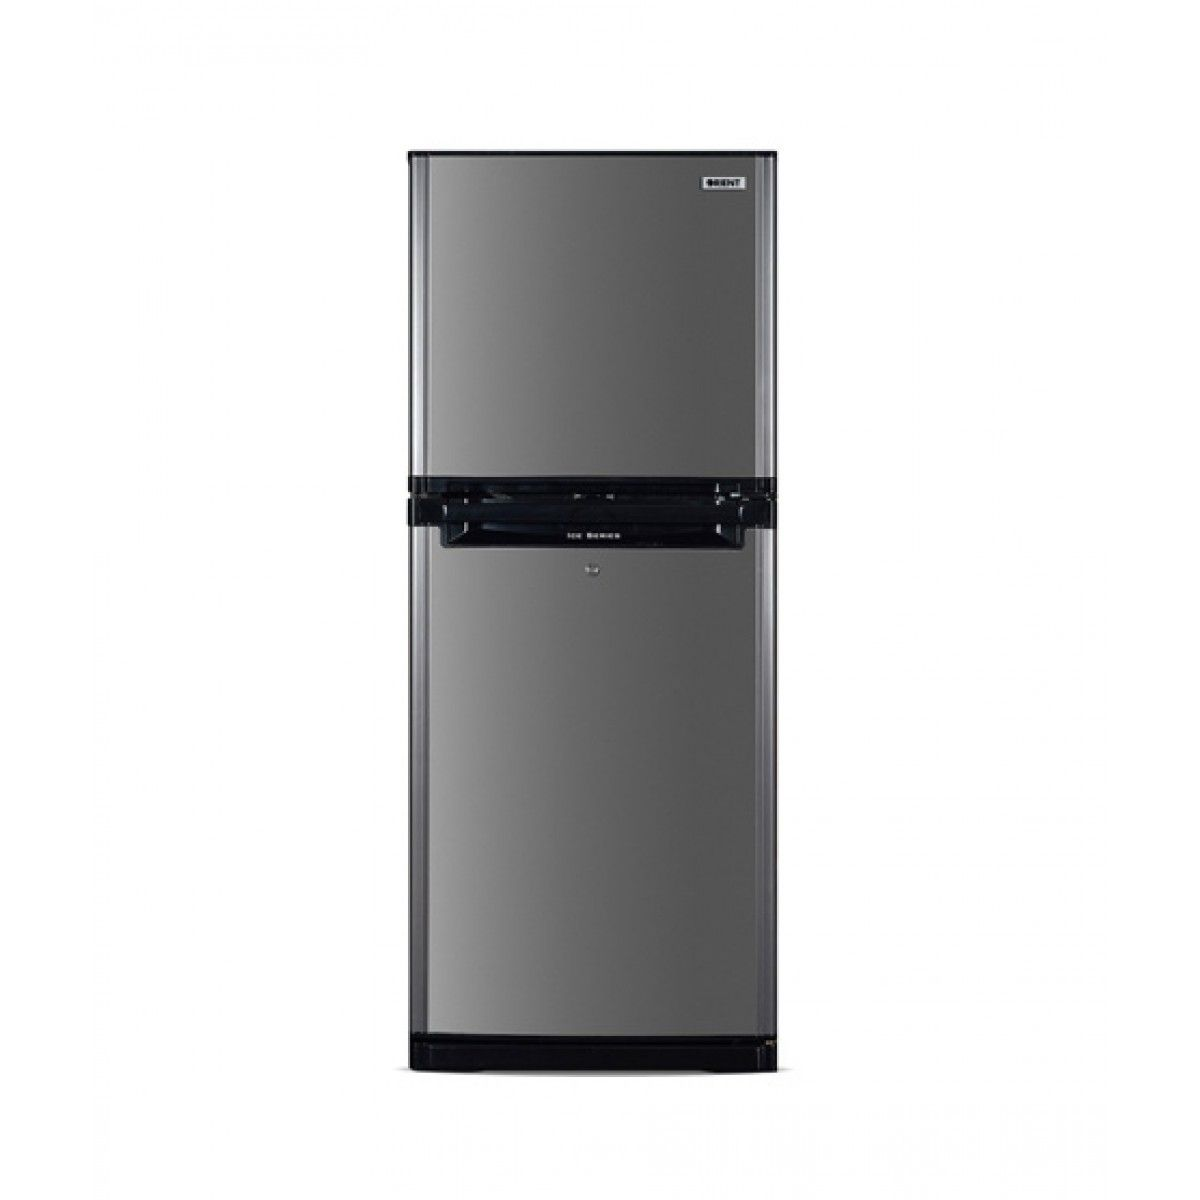 Orient Ice 330 Freezer-on-Top Refrigerator 11 Cu Ft Hair Line Silver (5554-1.4)